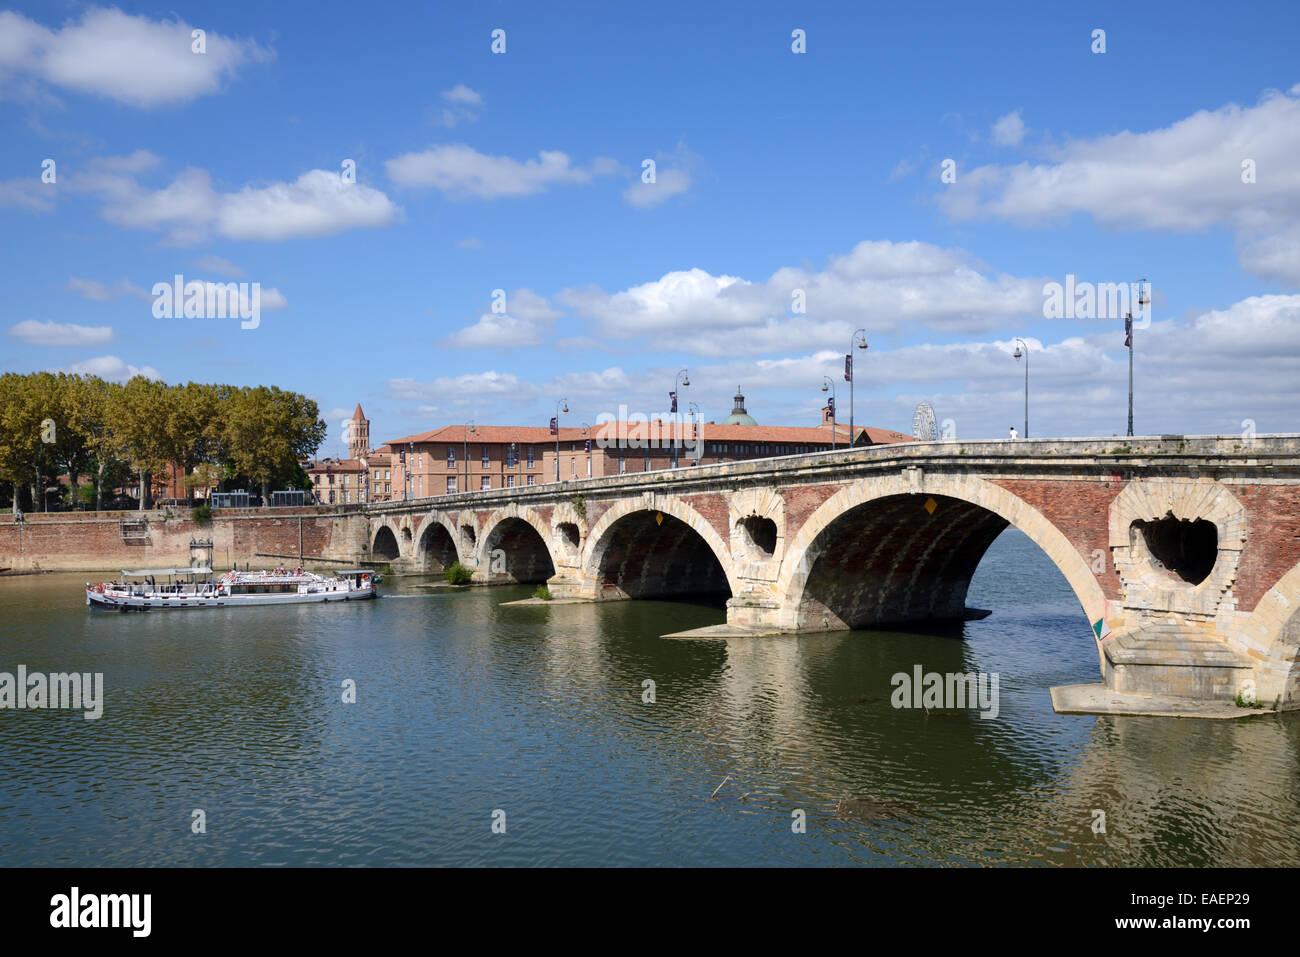 Cruise Boat or River Cruiser on Garonne River and Pont Neuf Bridge Toulouse Haute-Garonne France - Stock Image